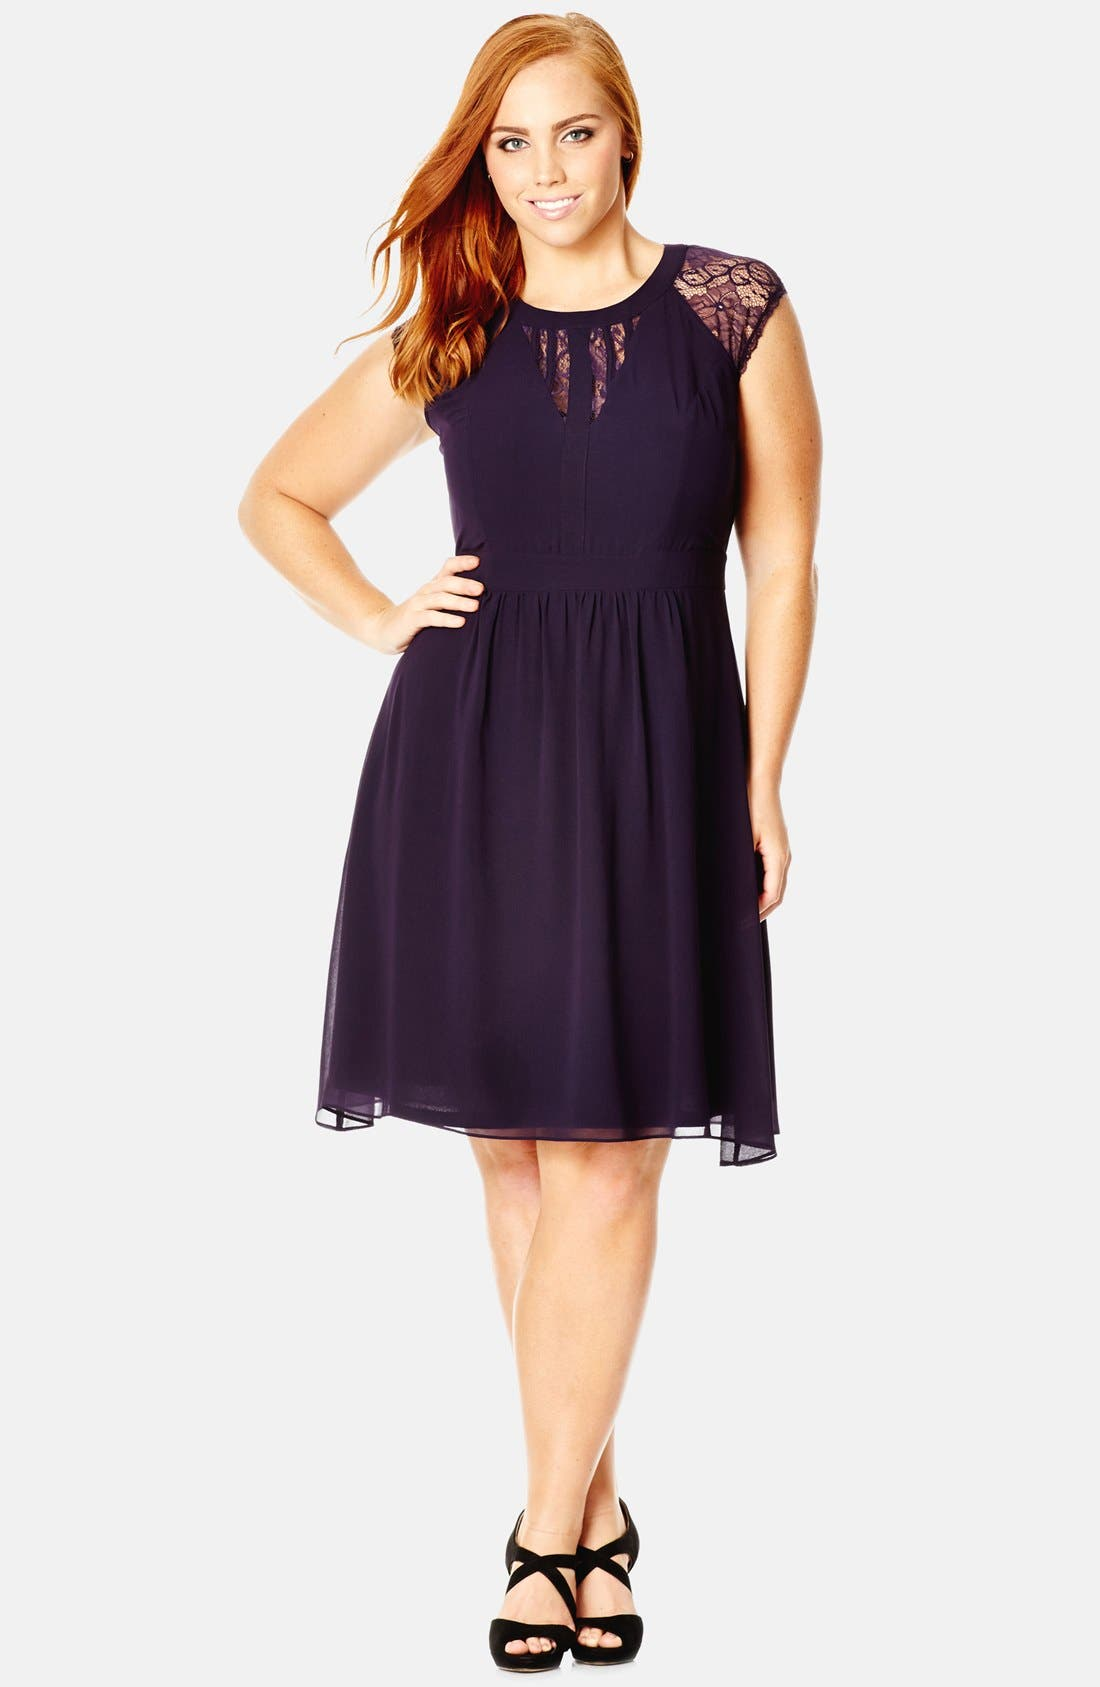 Plus Size City Chic Dark Romance Lace Detail Dress